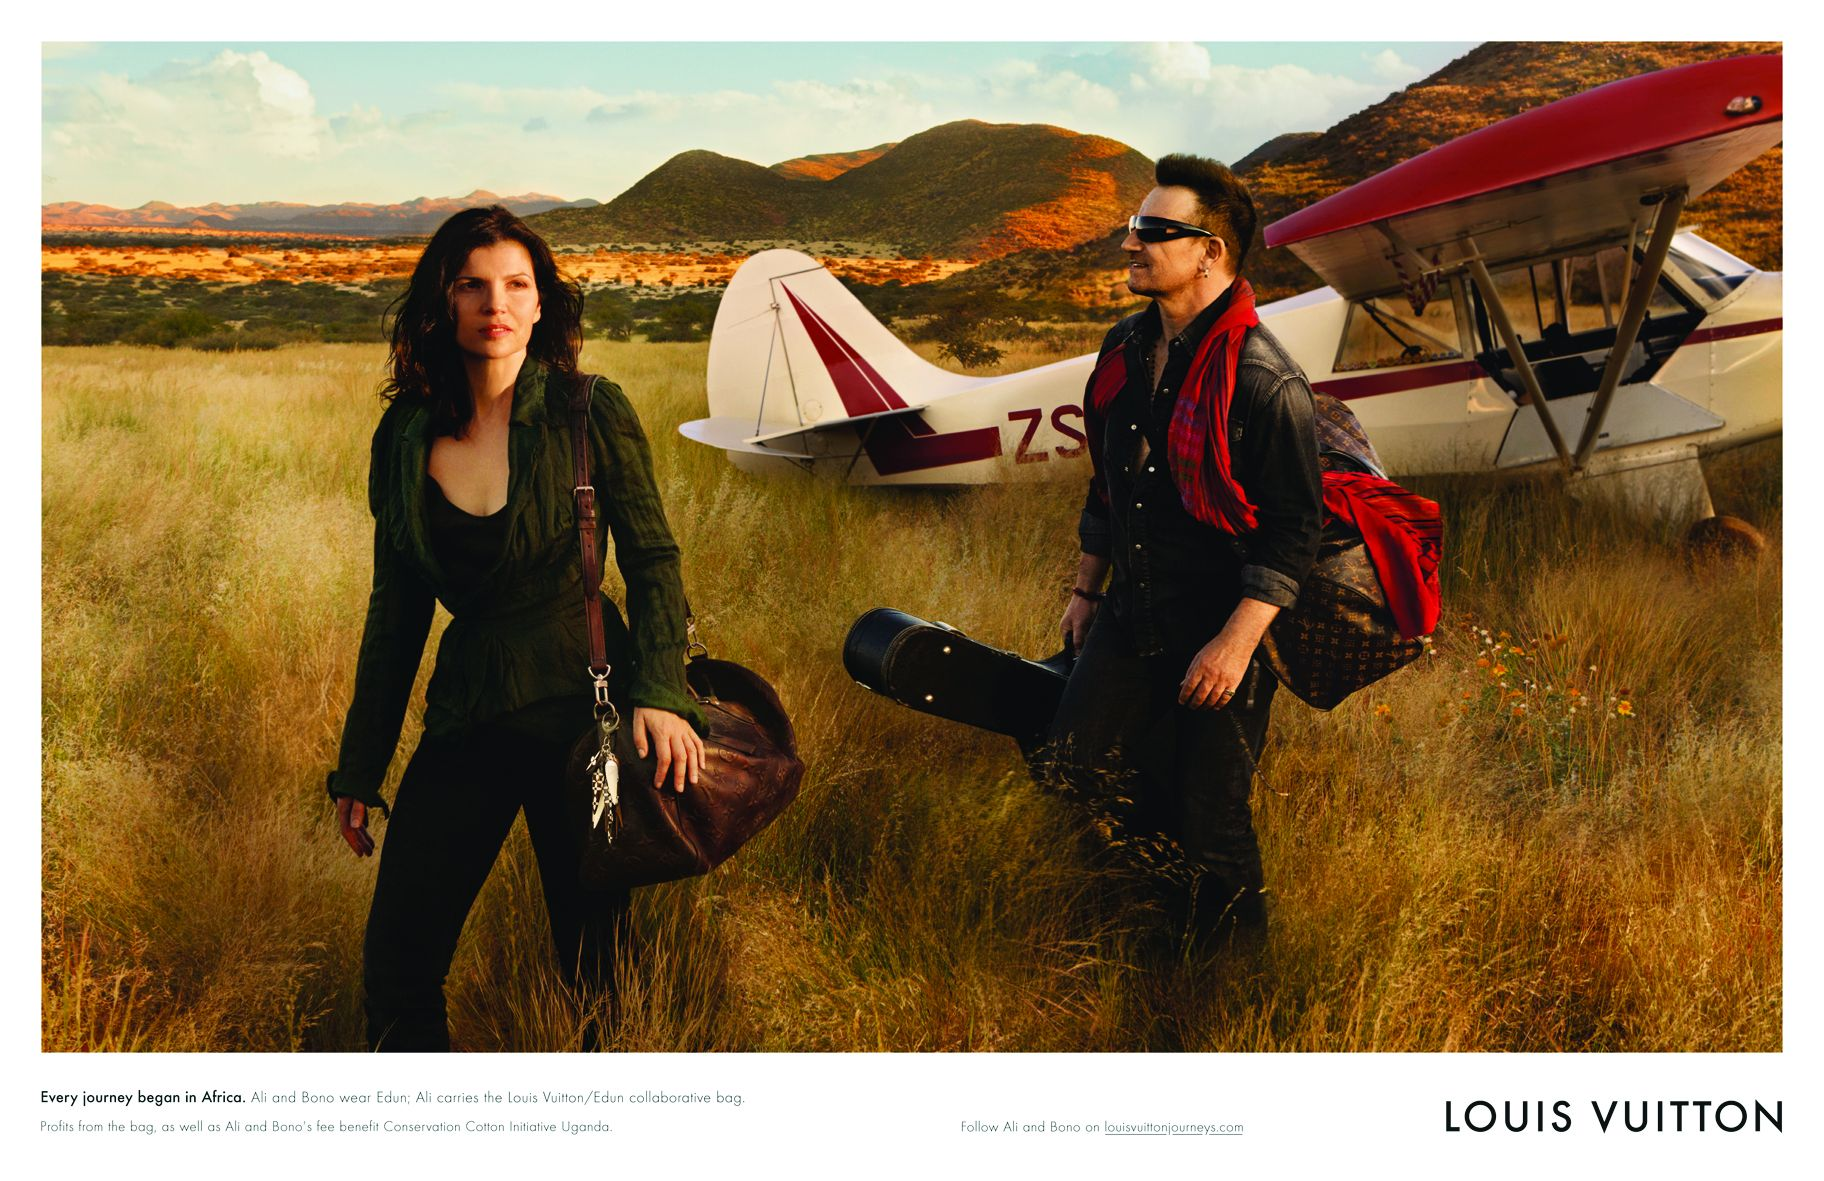 Campagne Louis Vuitton featuring Bono & Ali Hewson